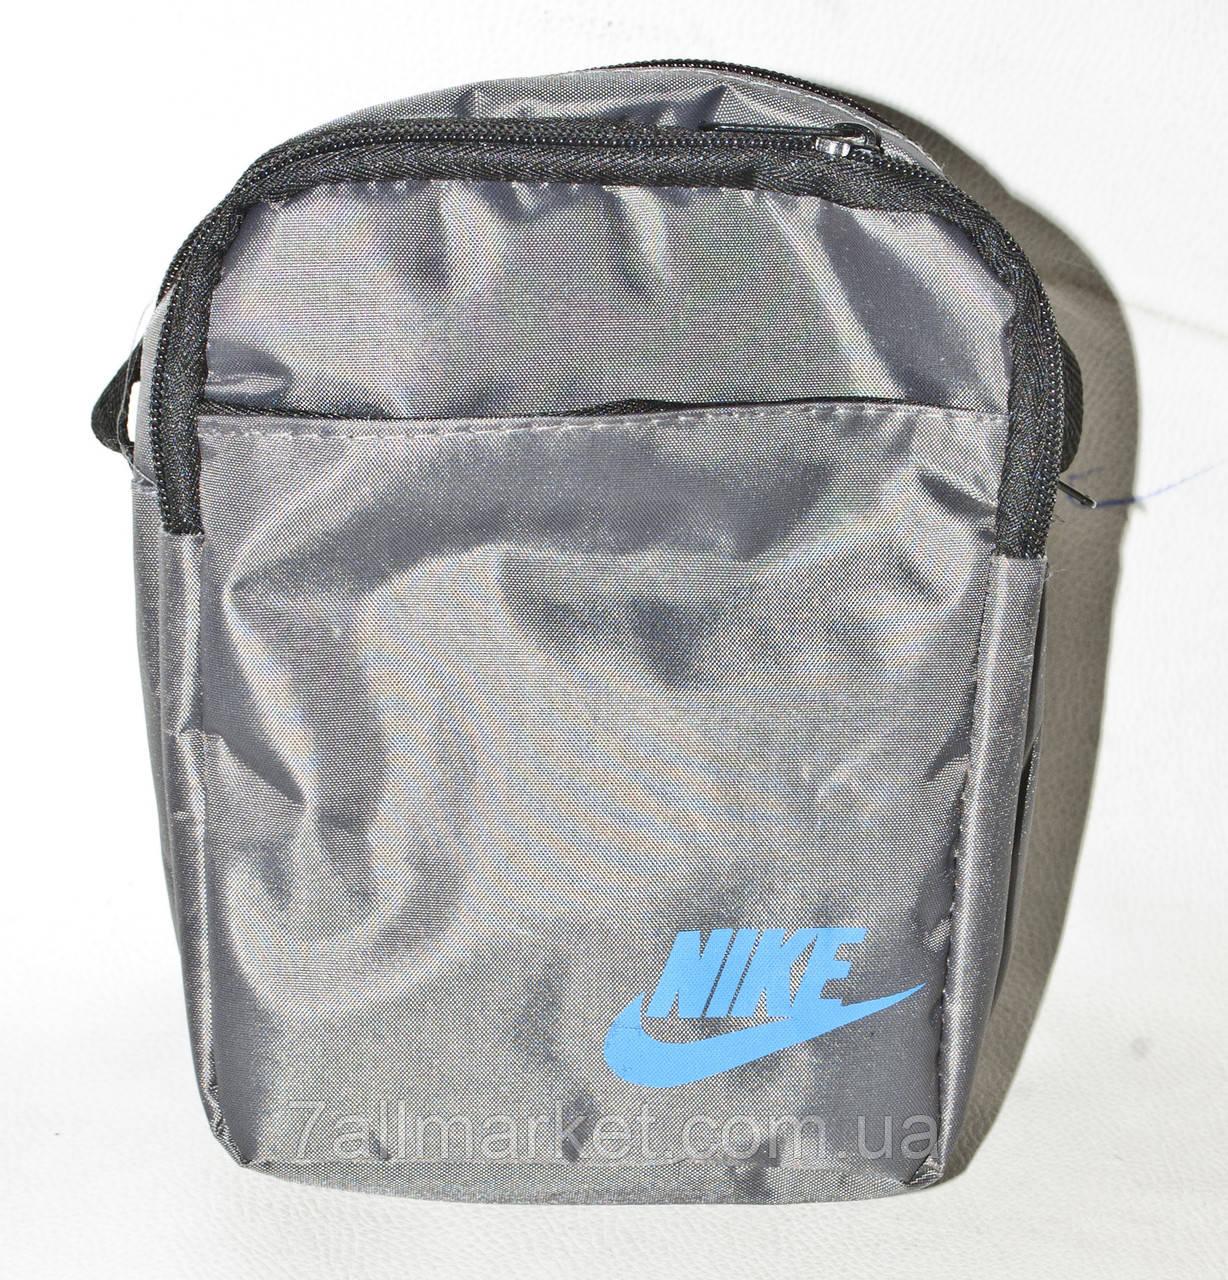 fd8f38e3 Сумка спортивная Nike оригинальная размер 13*20 Серии